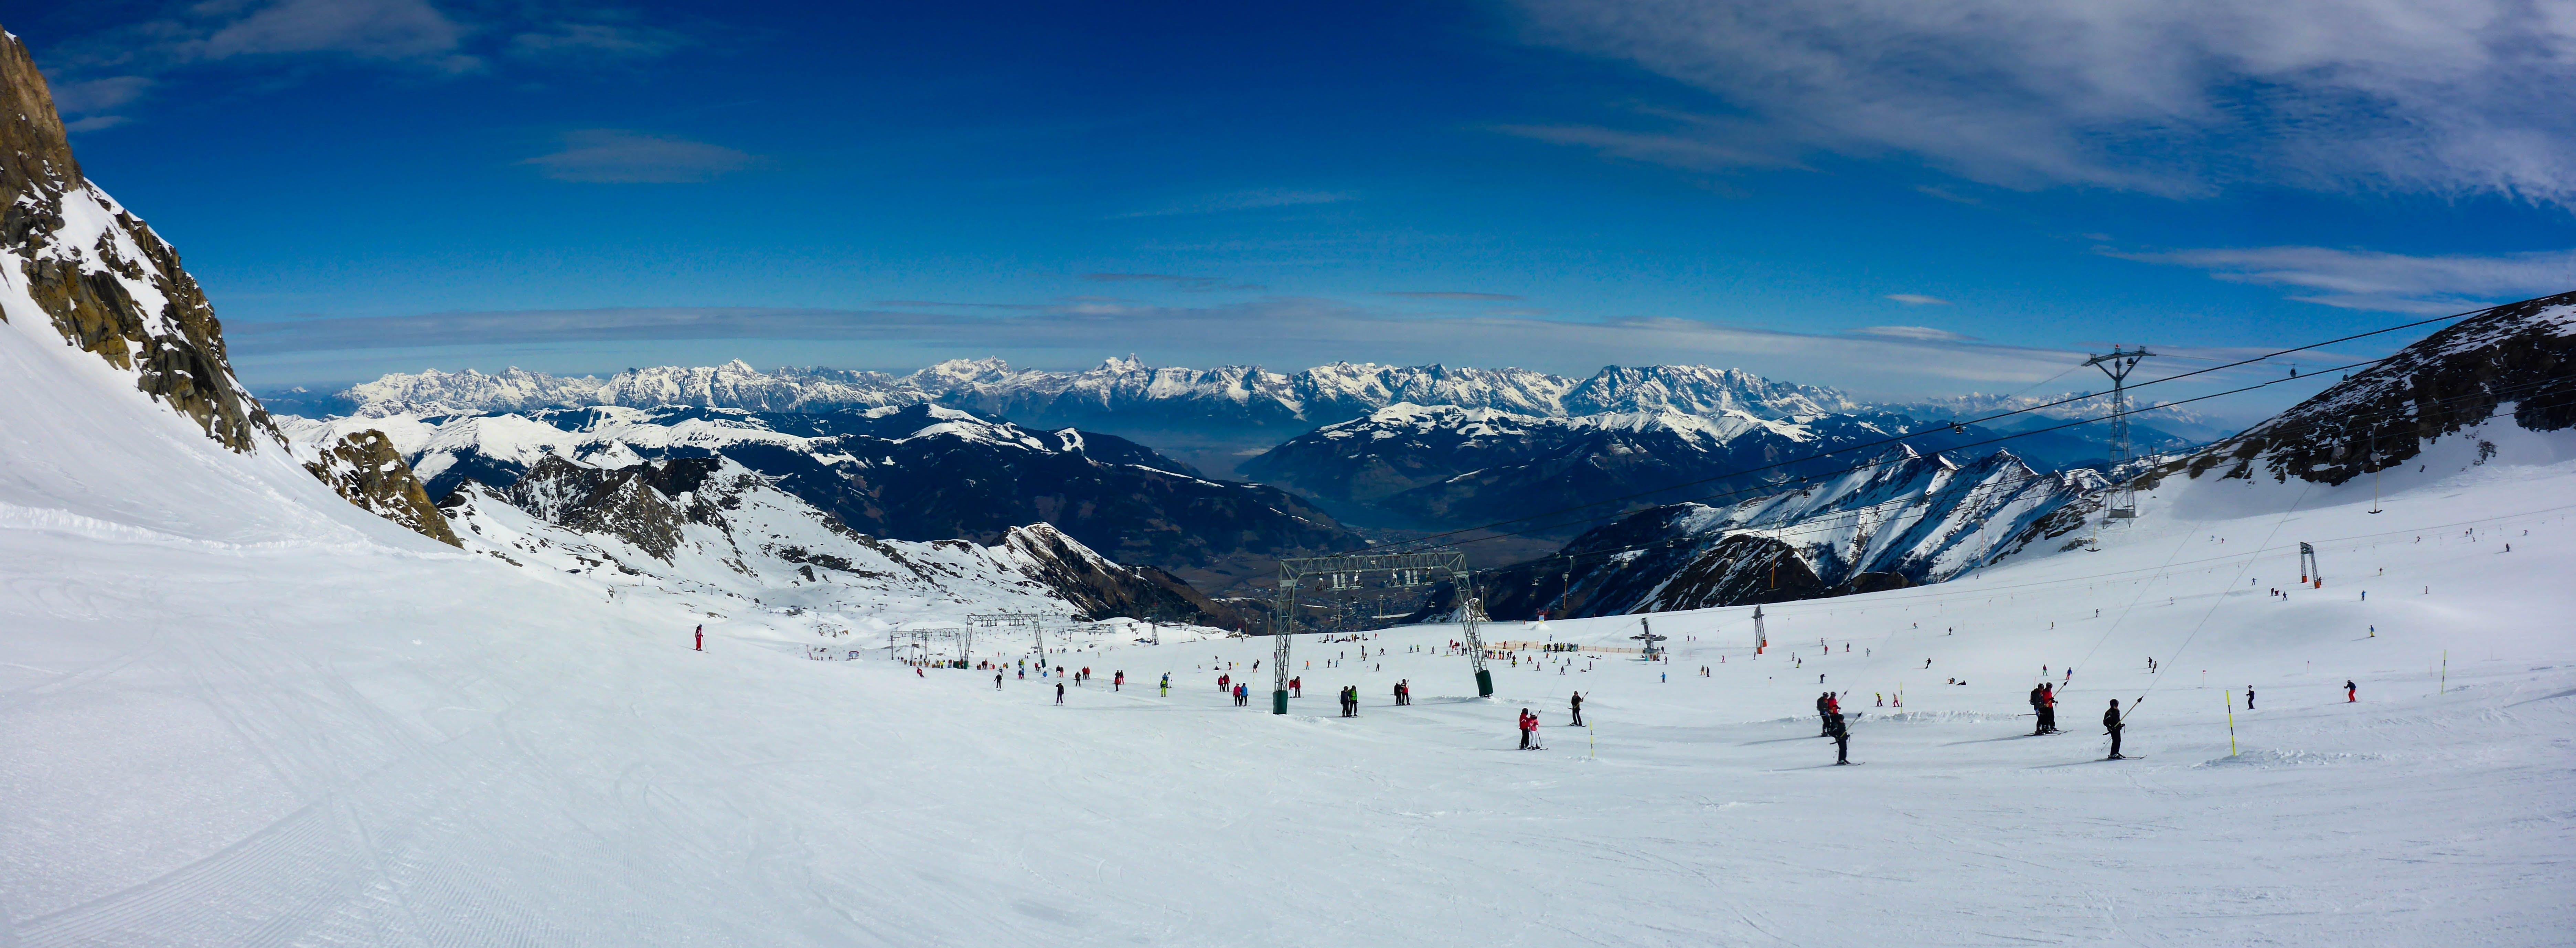 Snow-filled Summit